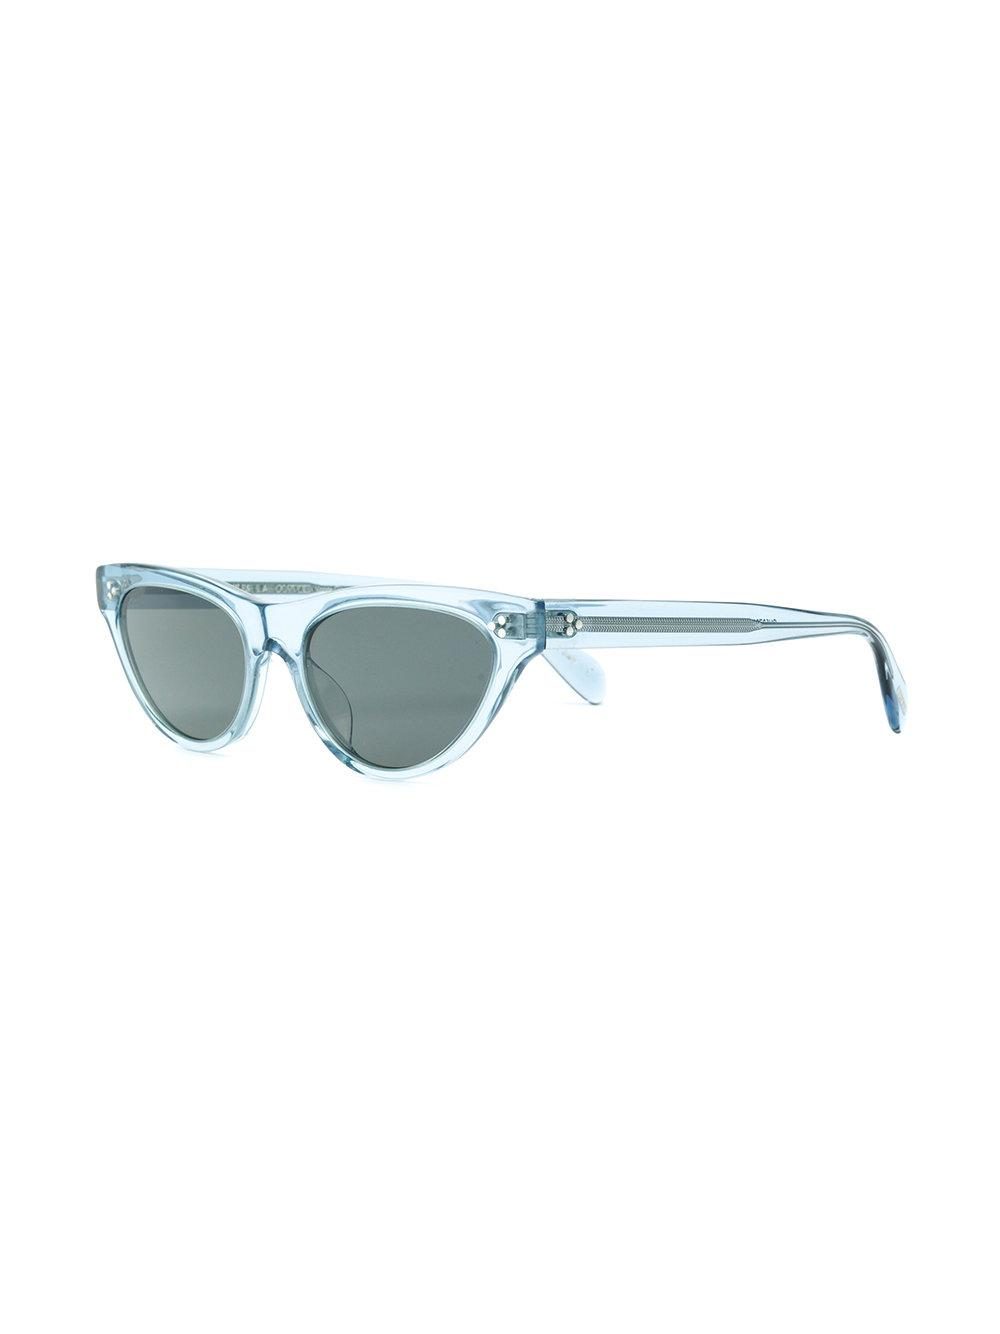 Oliver Peoples Zasia Cat Eye Sunglasses in Blue